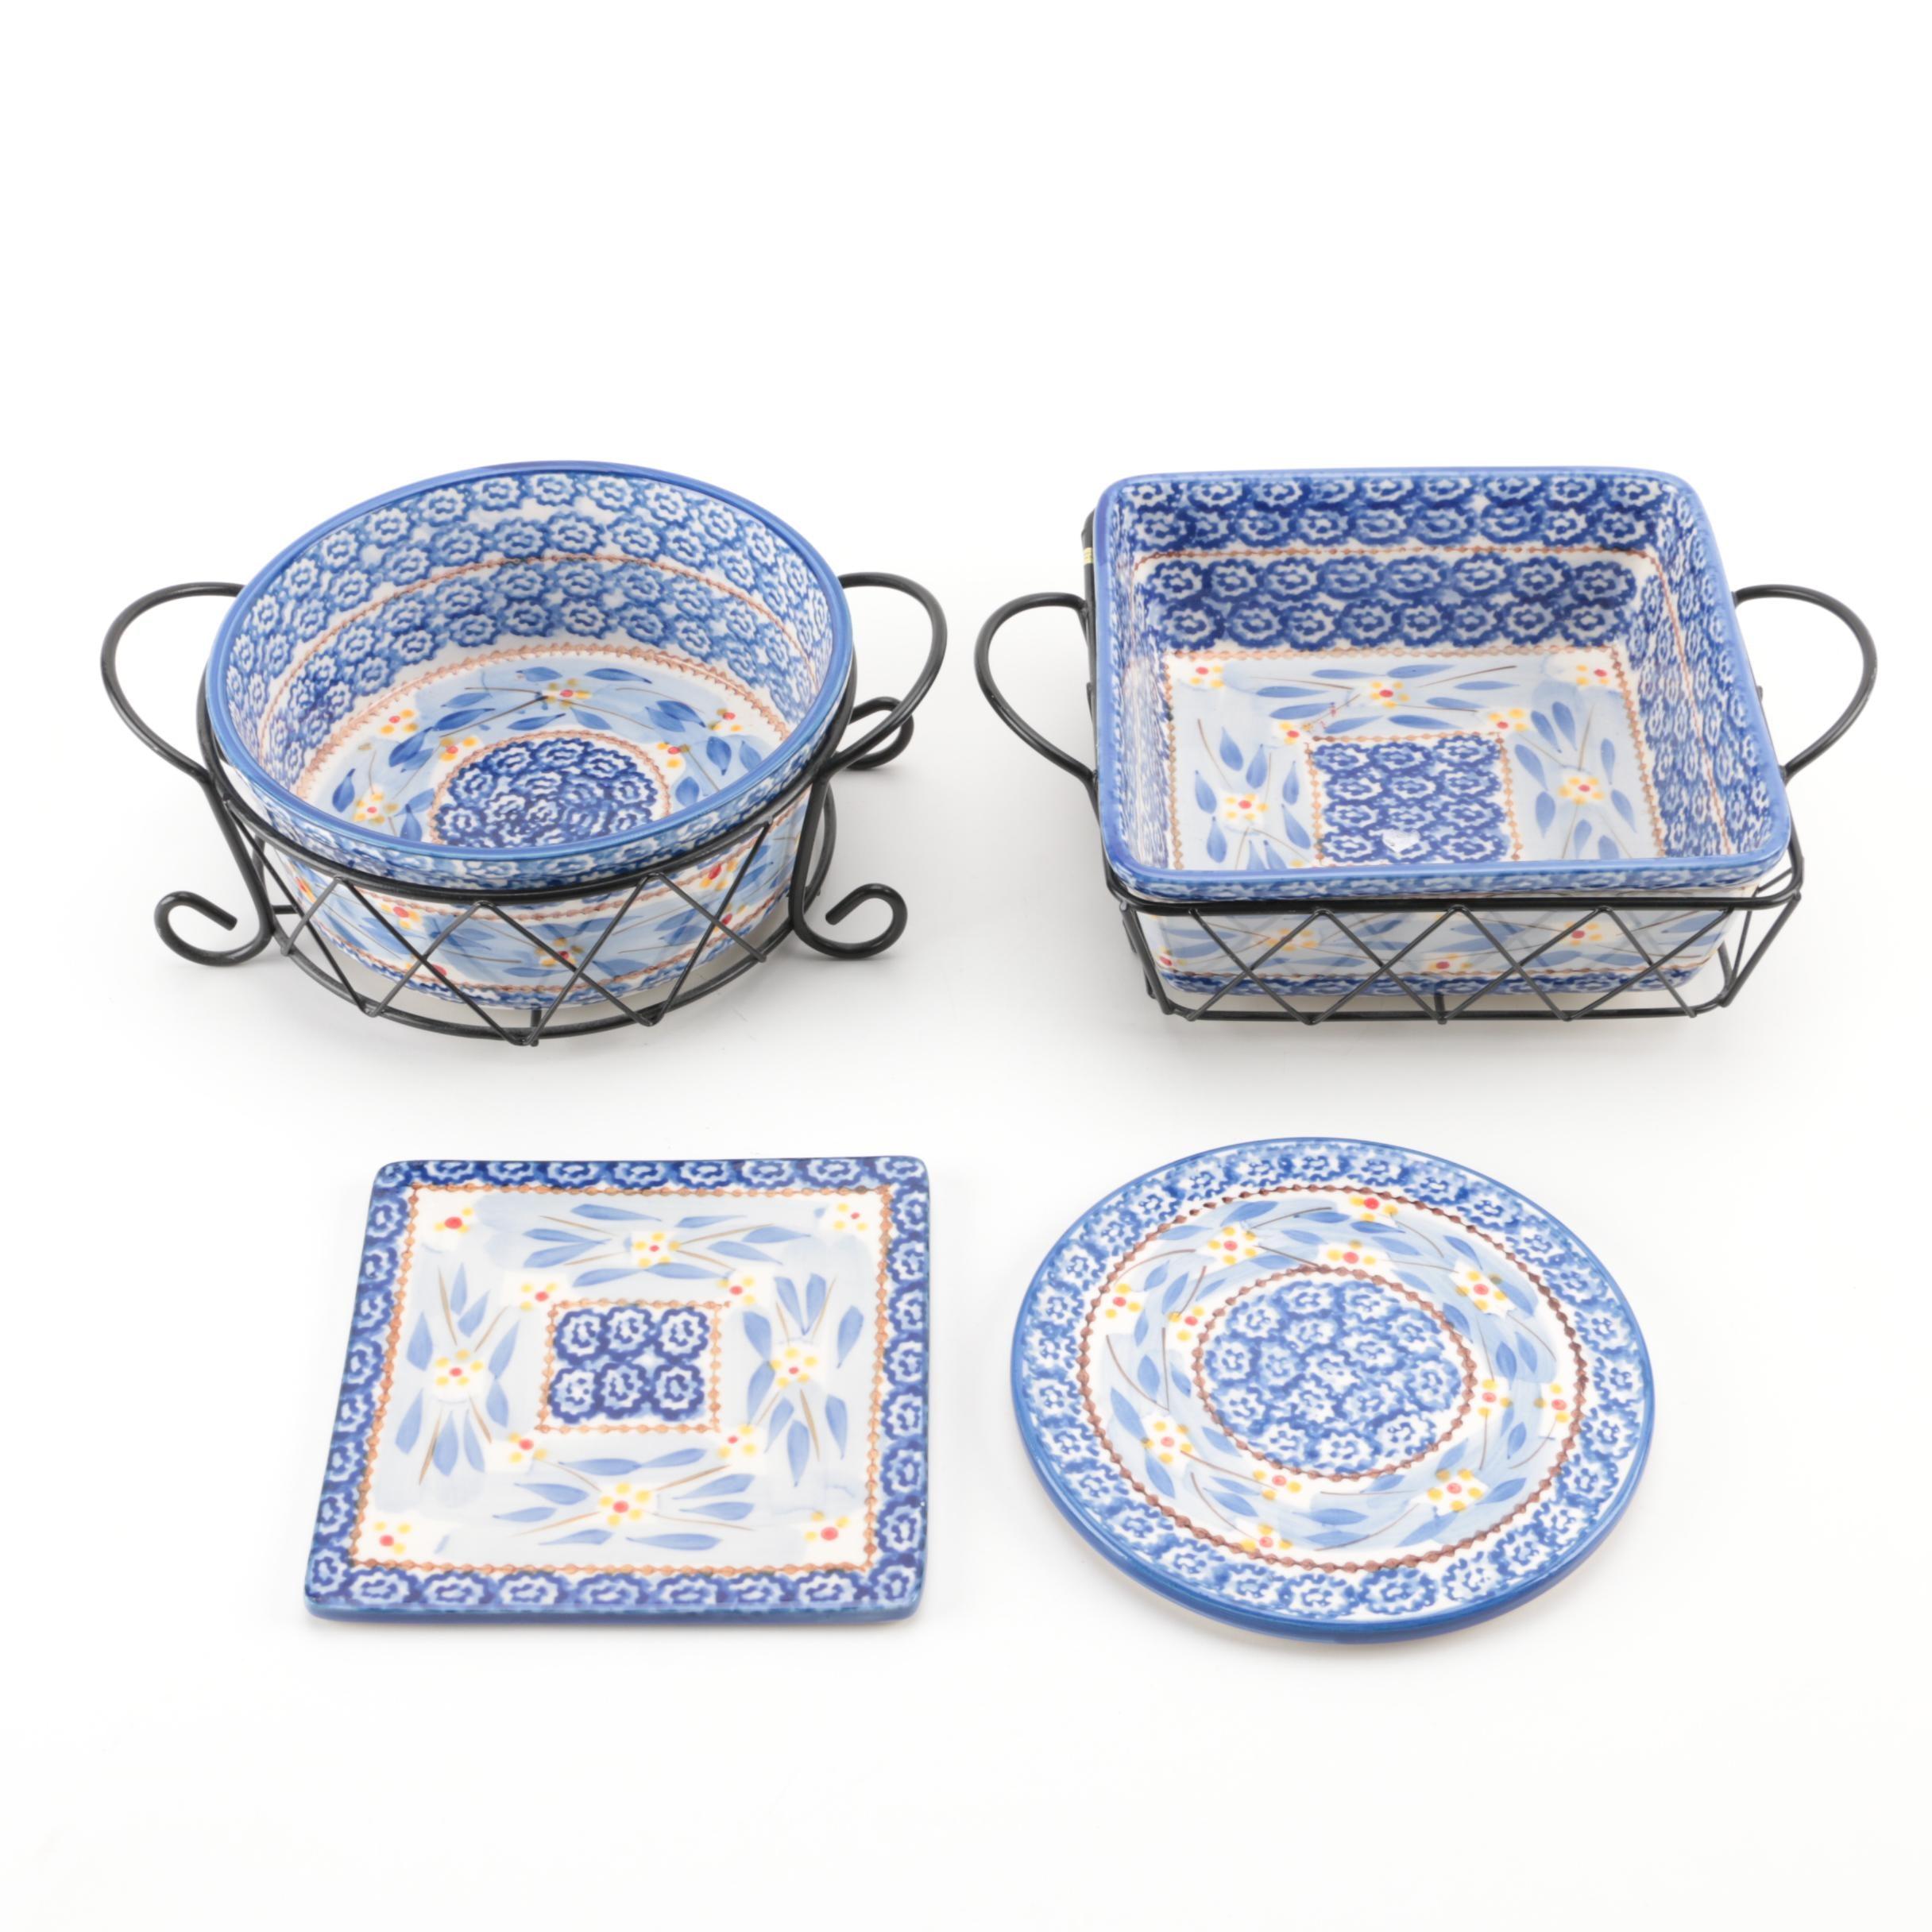 Ceramic Temp-Tations Dinnerware Set